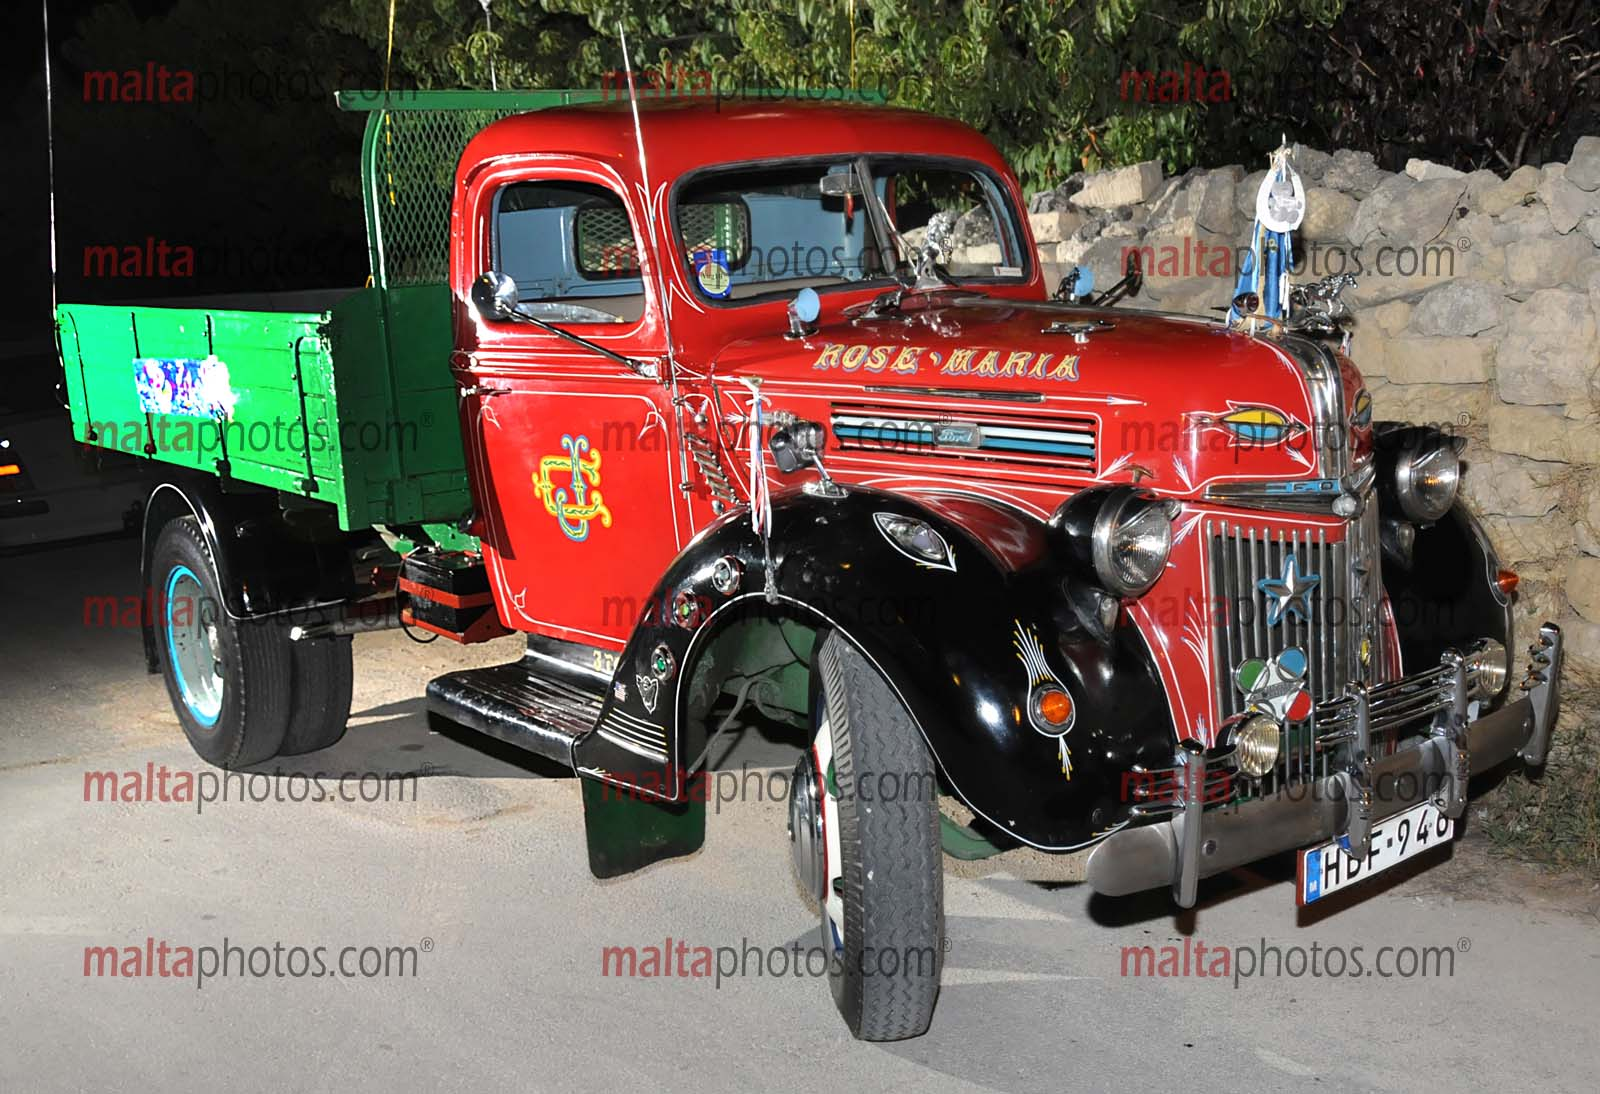 Vehicles Vintage Old Classic Cars - Malta Photos